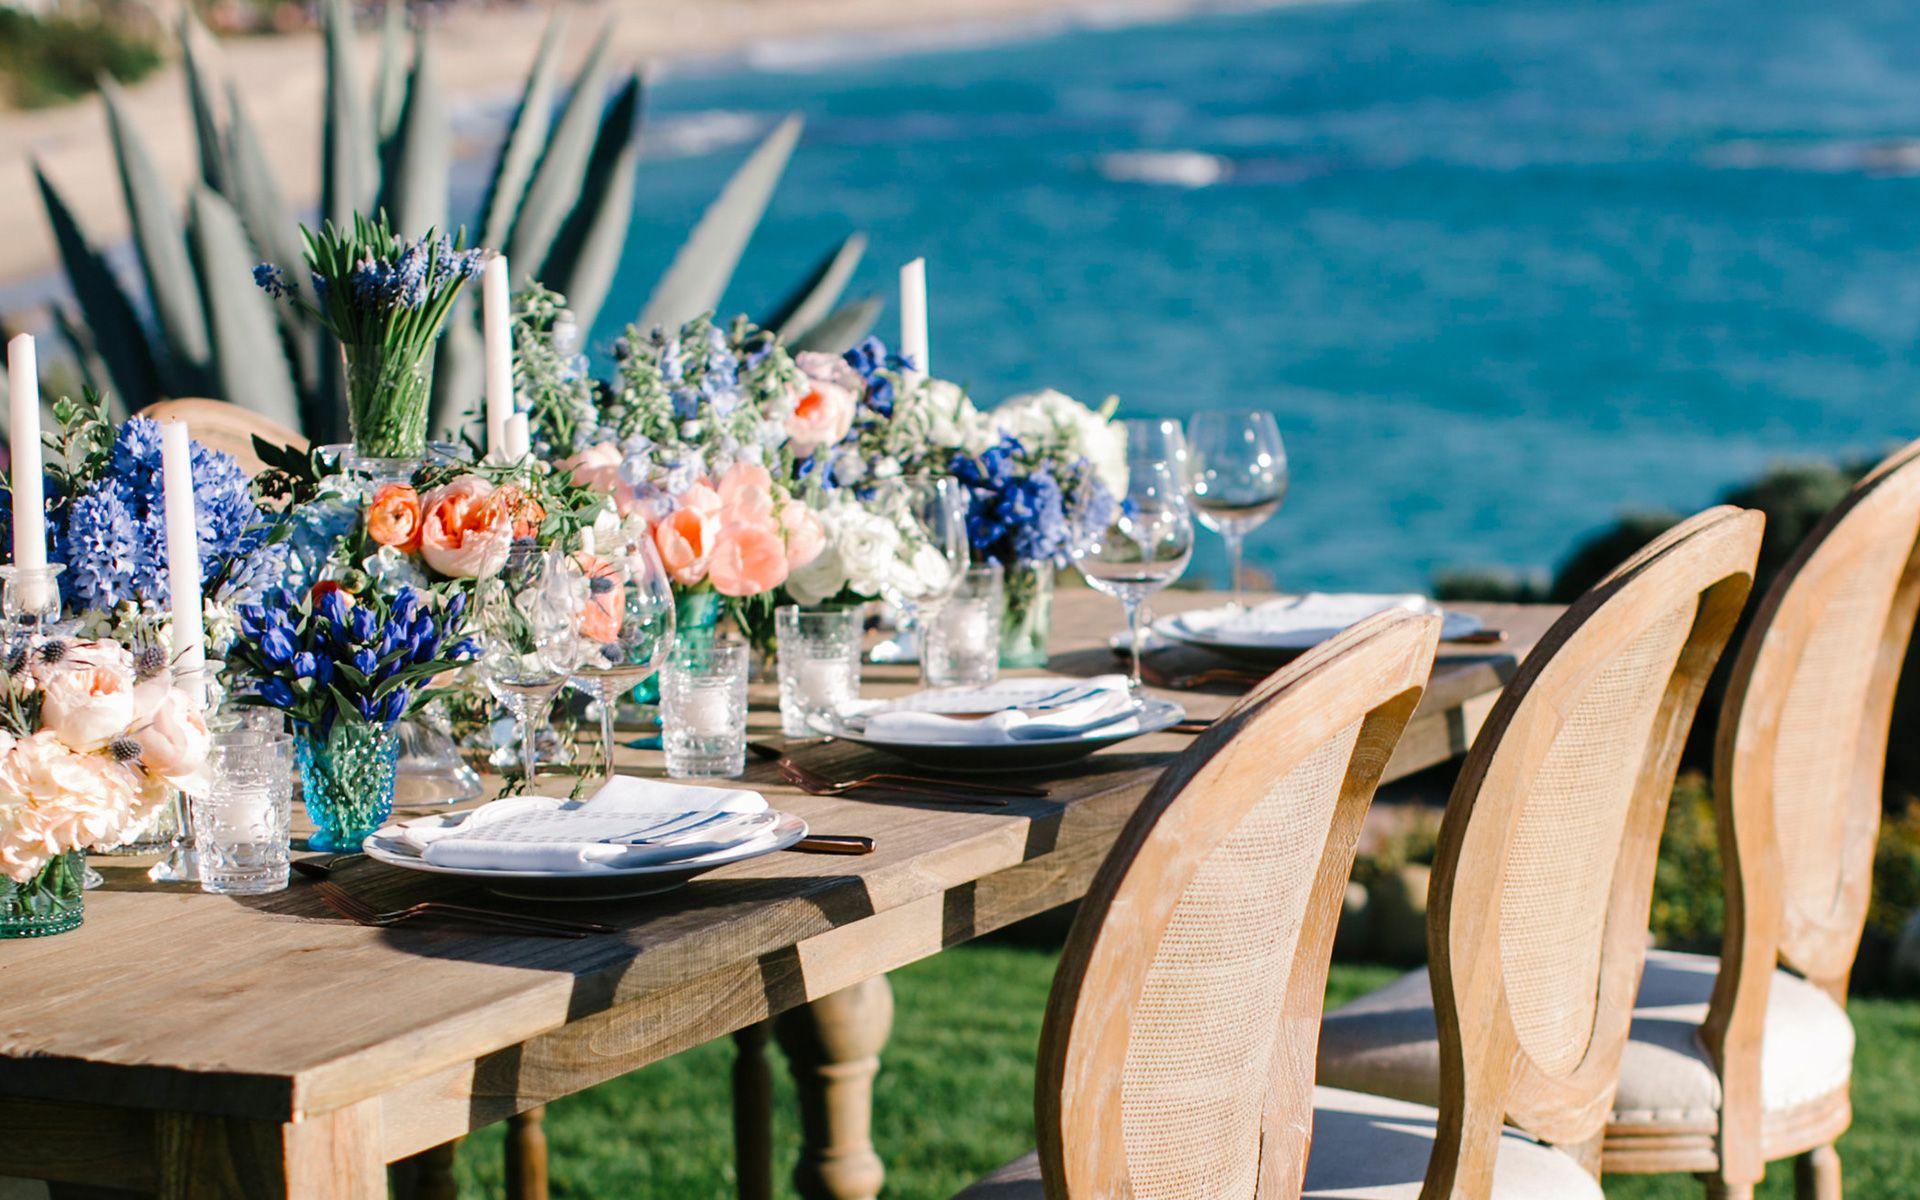 California beach wedding image gallery california beach